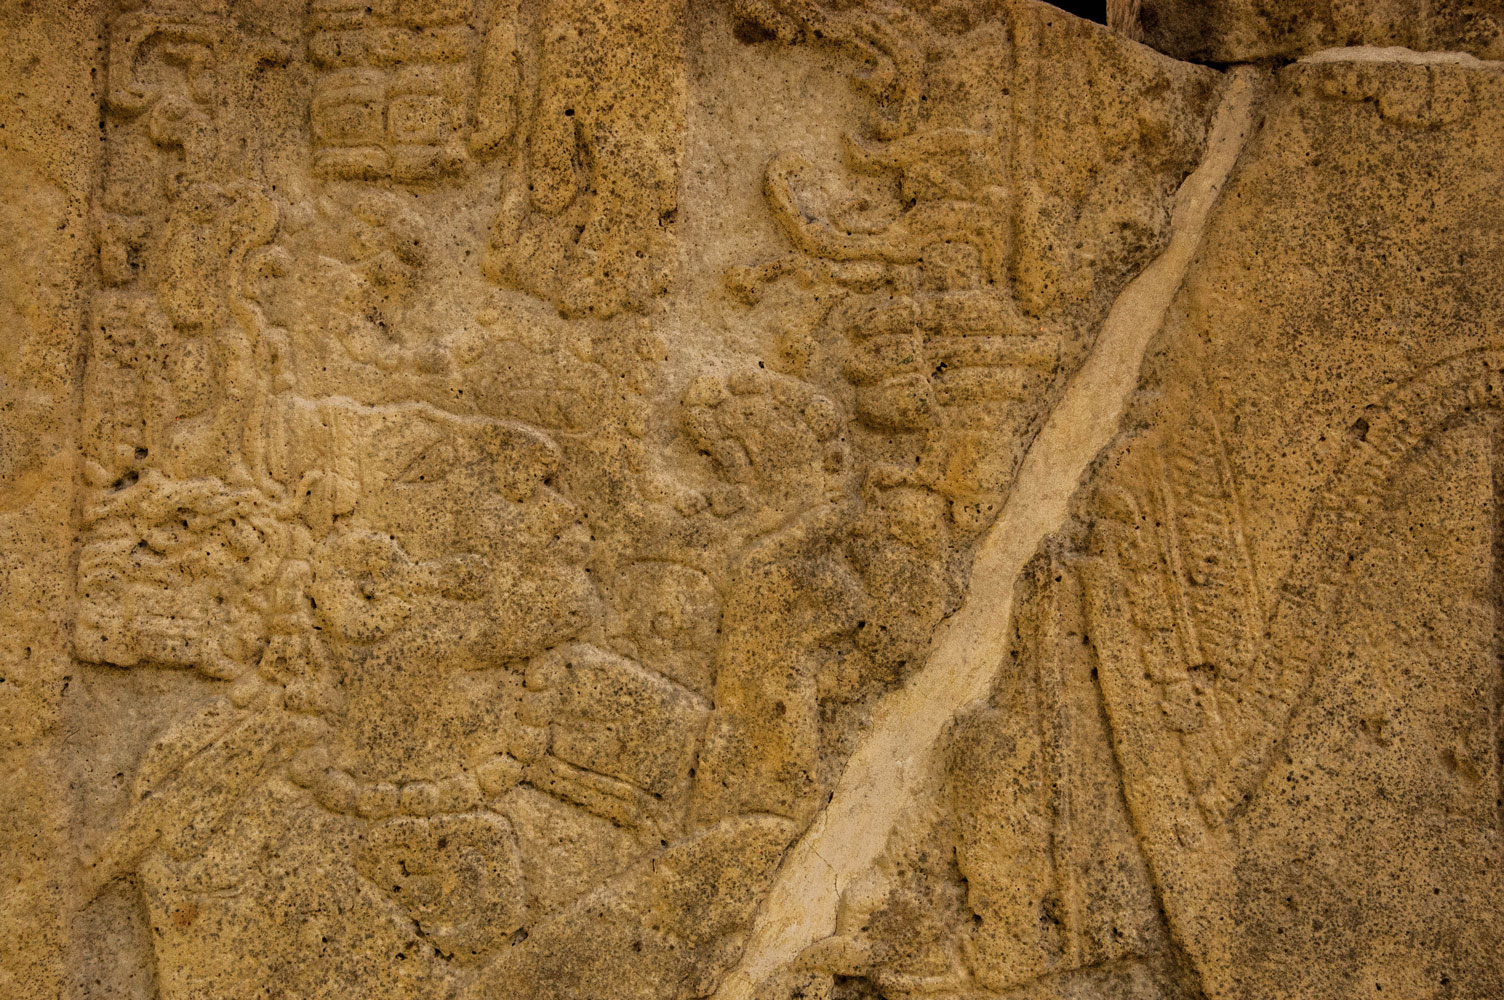 tours_en_chiapas_bonampak_yaxchilan_palenque_guias_en_chiapas_selva_lacandona_mayas_lacandones_zonas_arqueologicas_yaxchilan_aventuras_chankin_02